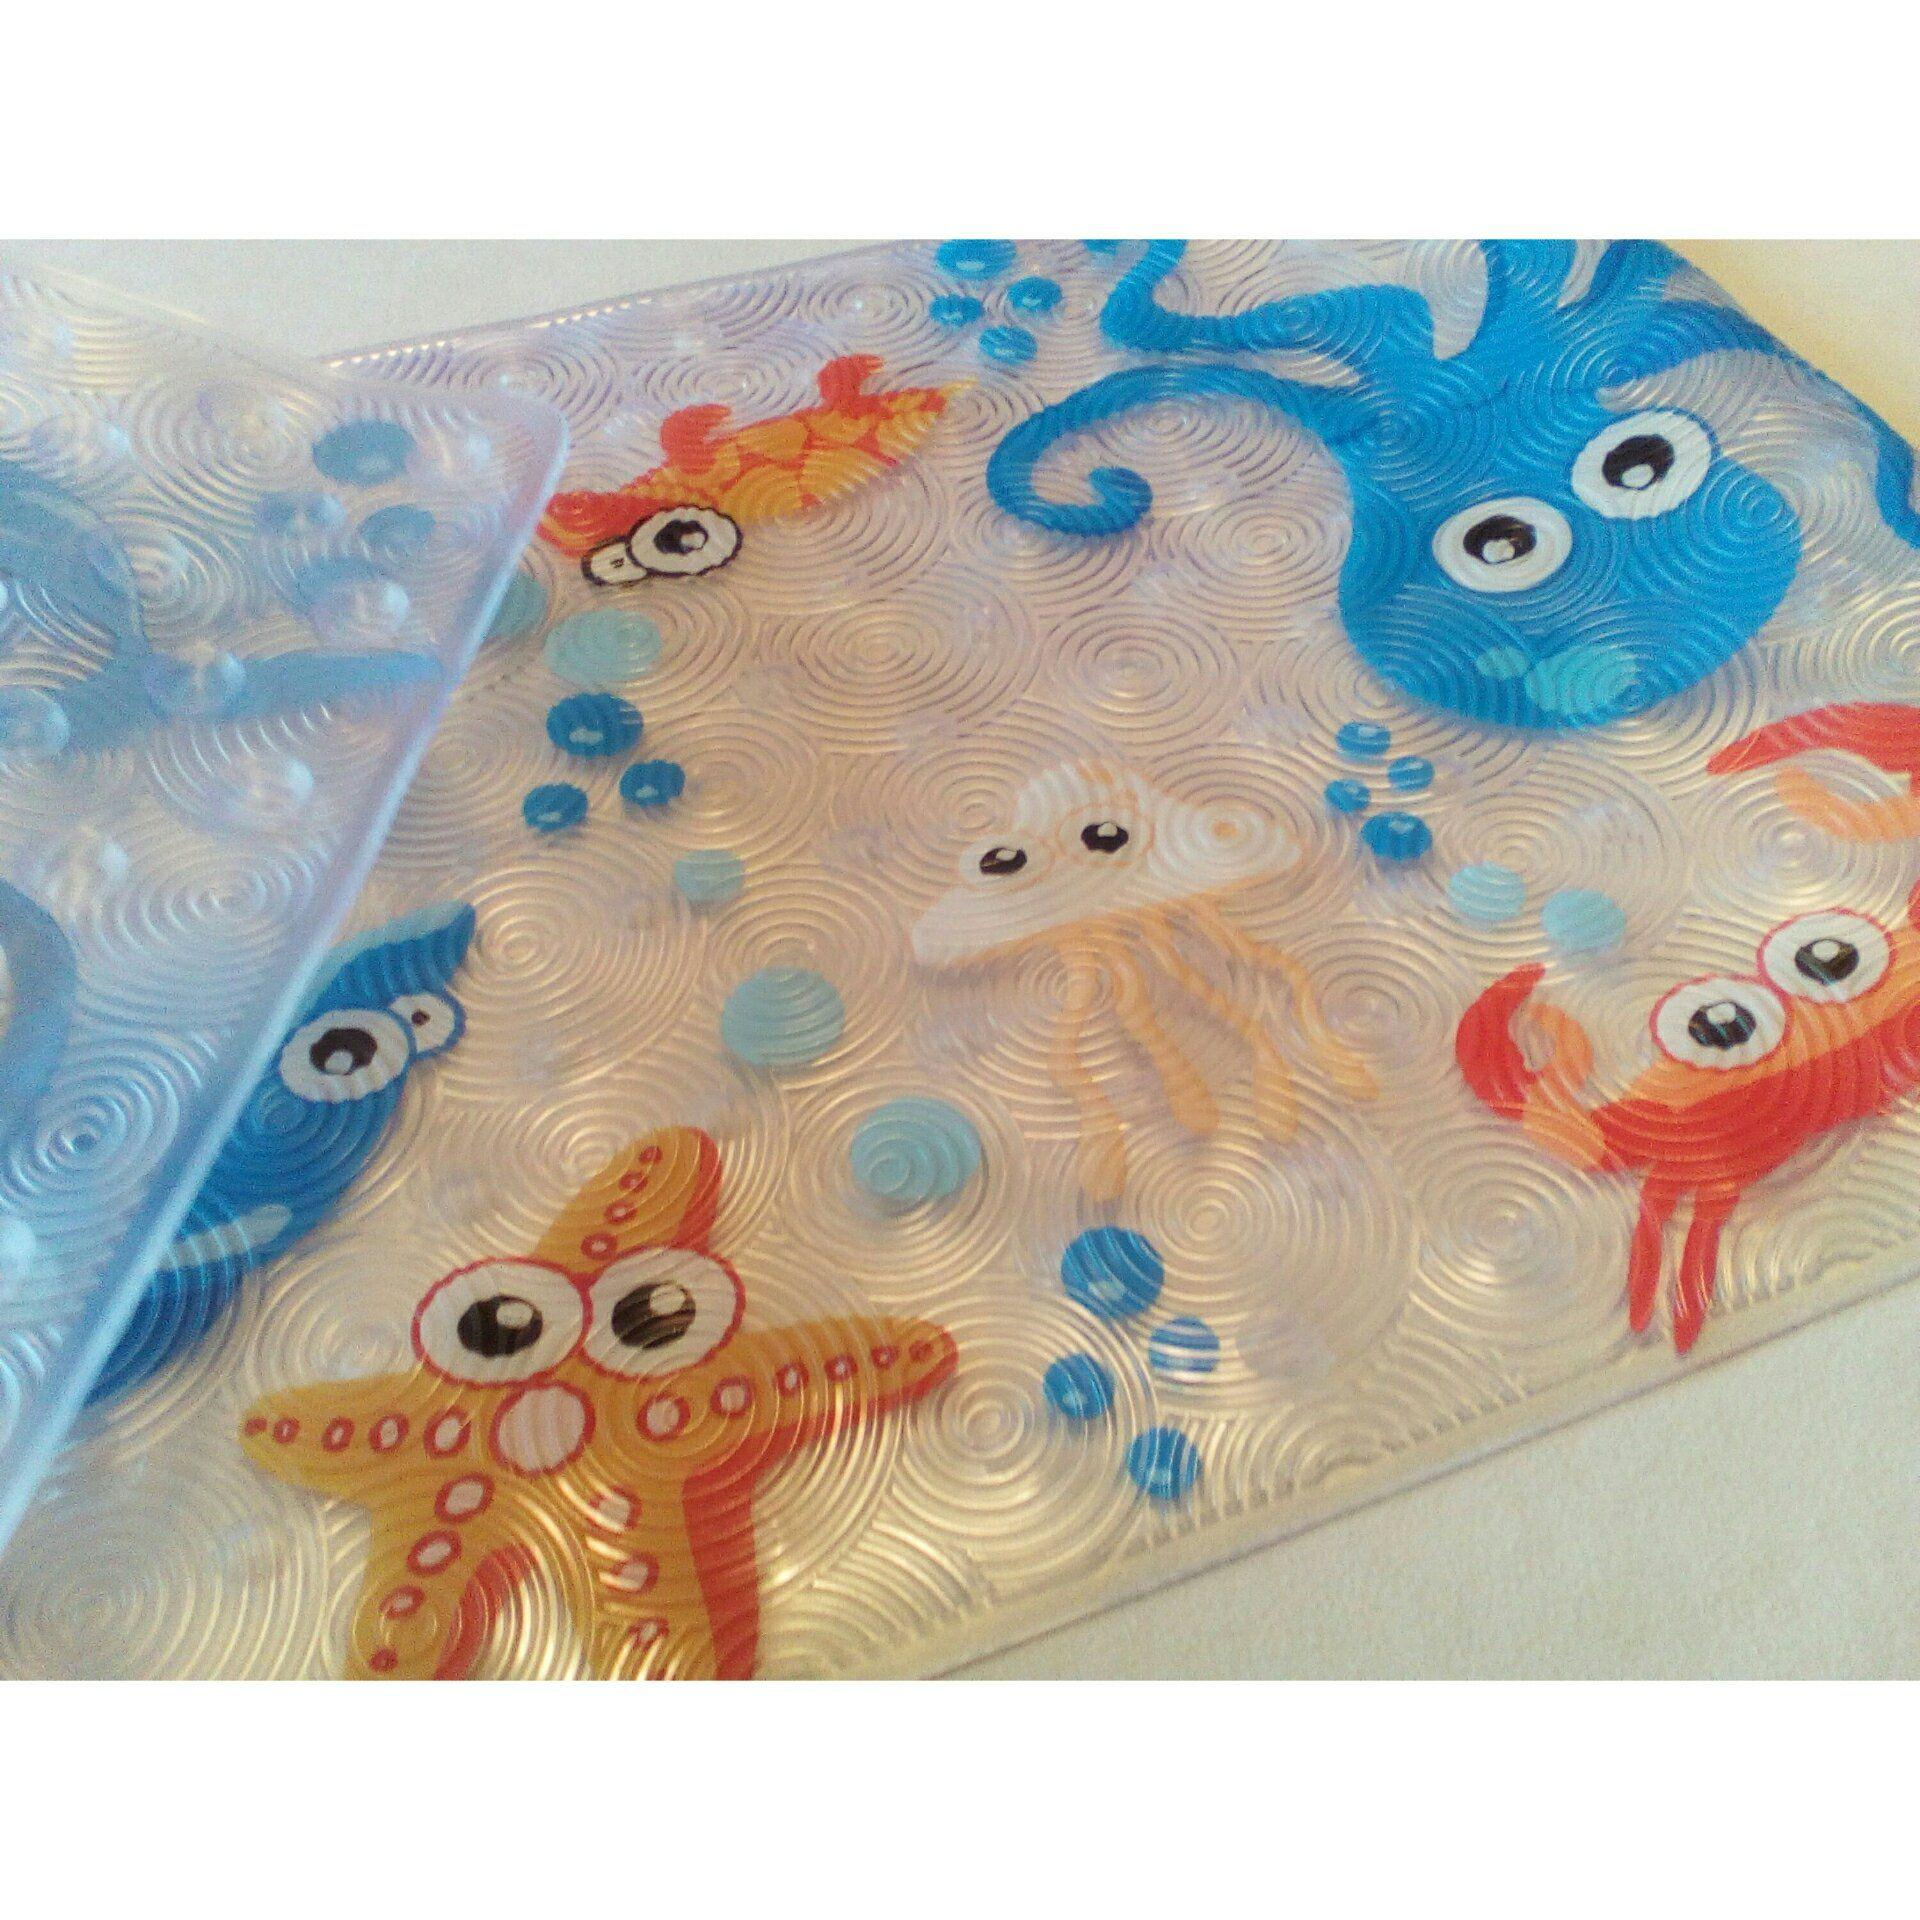 Warrah Rutschfeste Badewannenmatte Fur Kinder Badewannenmatte Wanne Kinder